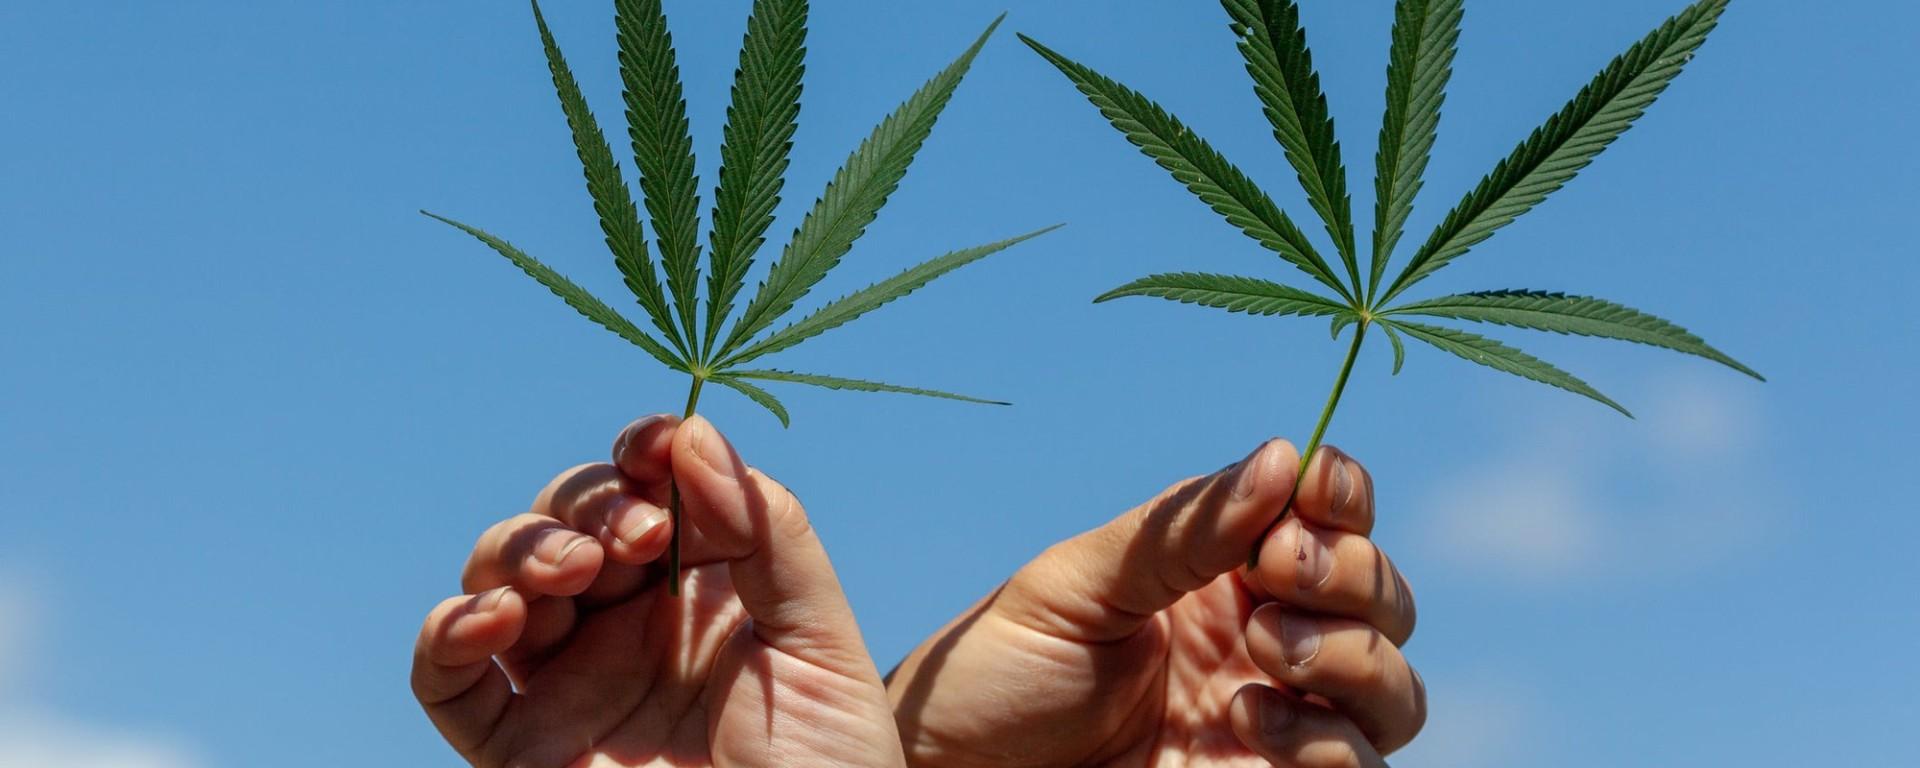 HeyHelloHigh Cannabis Content for Women | Image via Getty